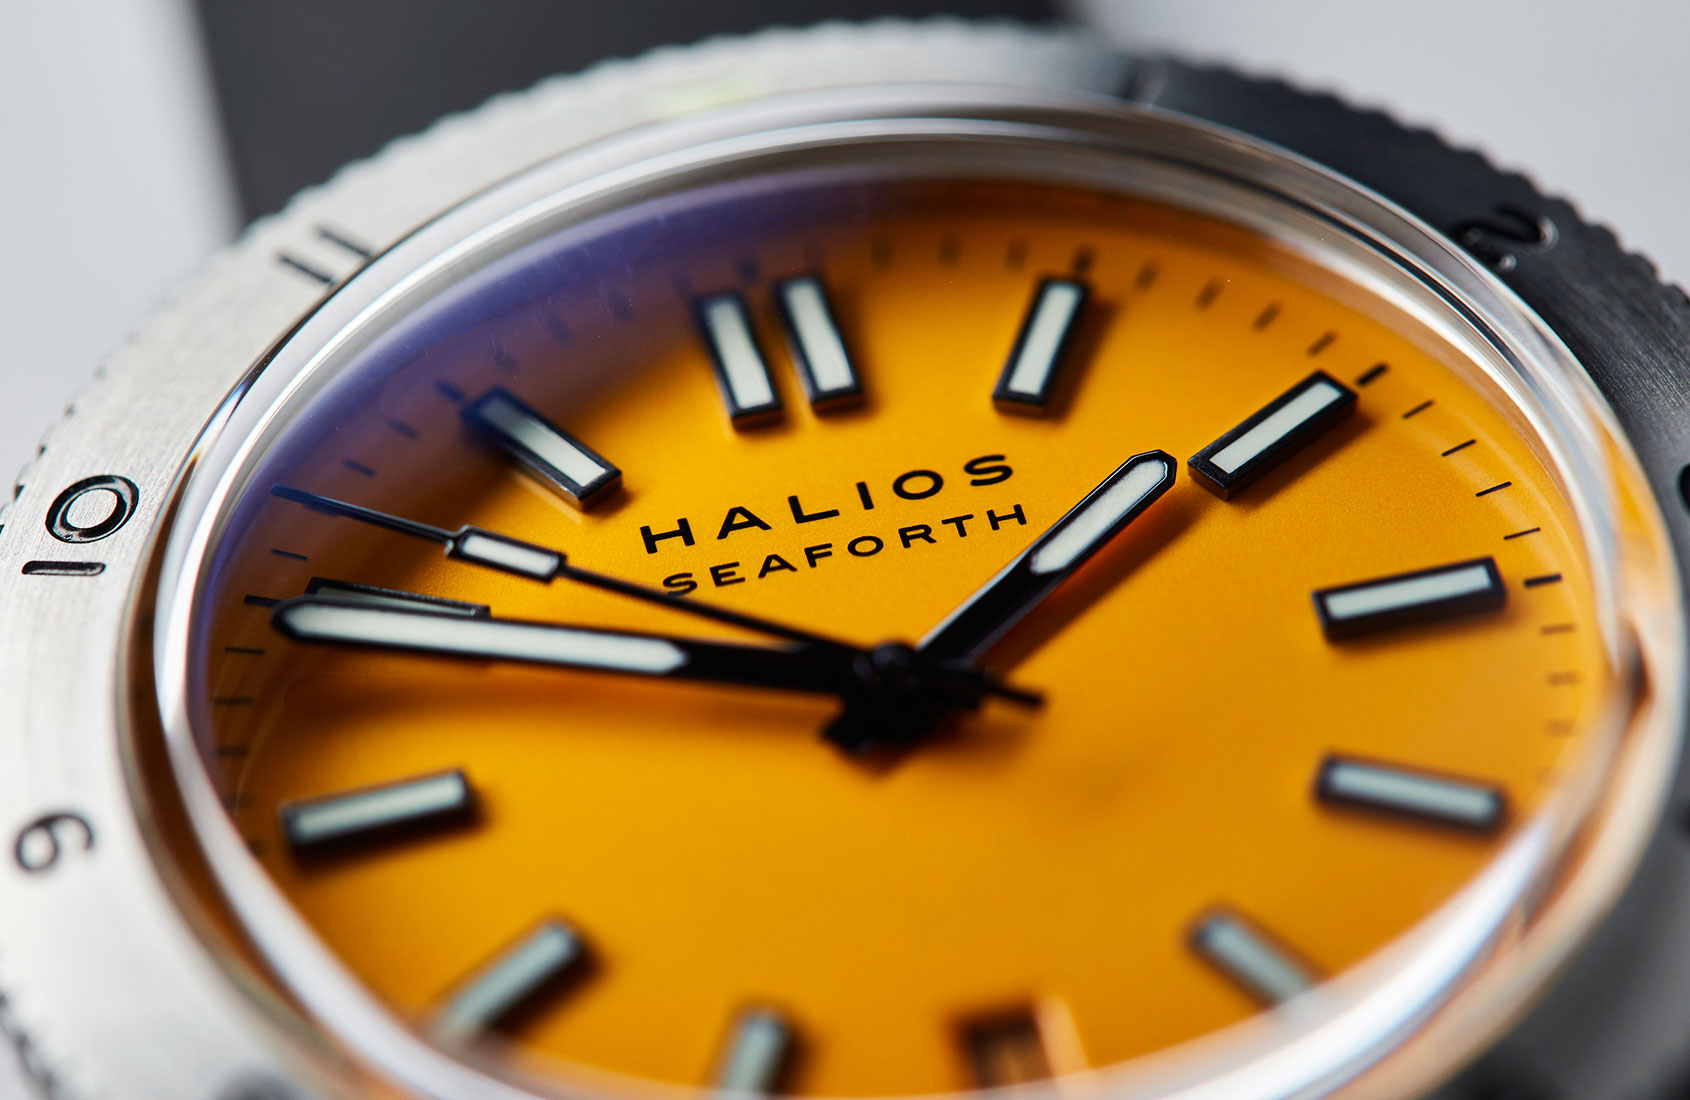 Halios watches